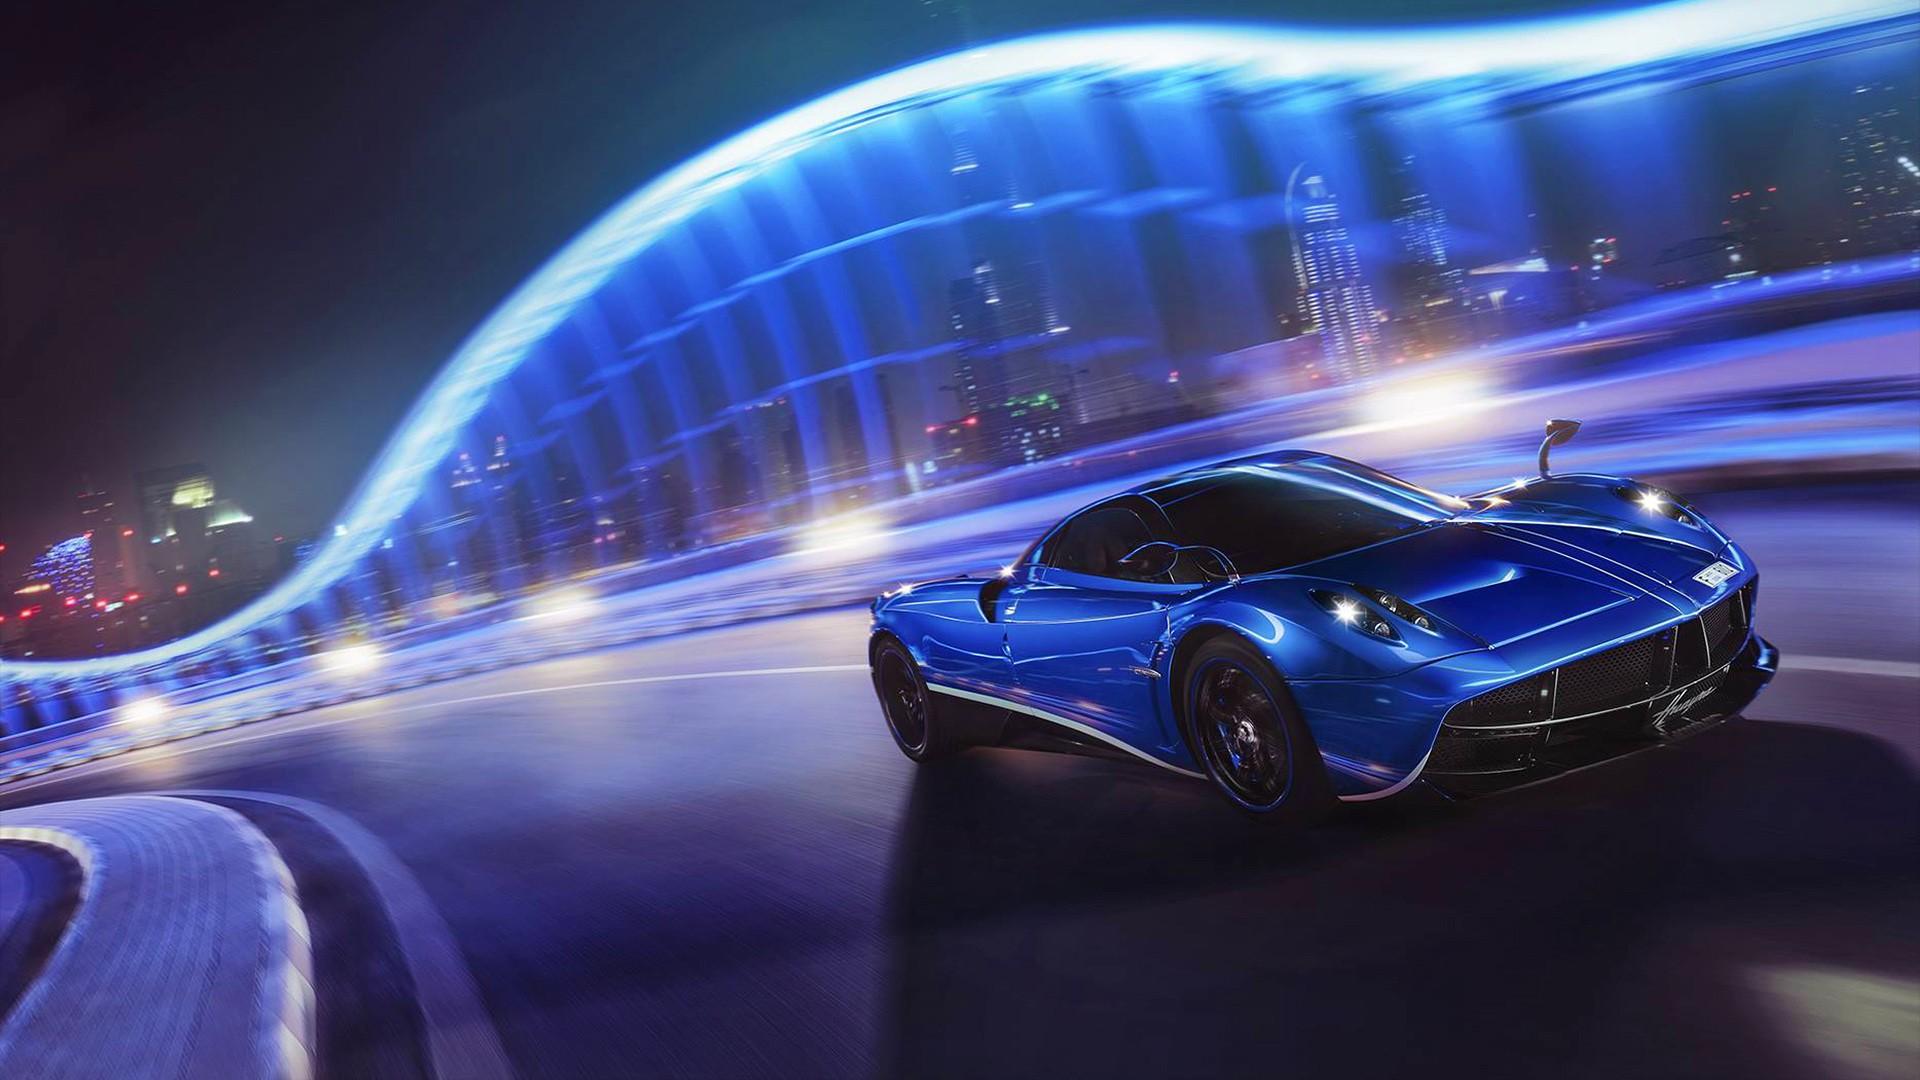 BMW Of Lincoln >> Pagani Huayra 2 Wallpaper | HD Car Wallpapers | ID #5685